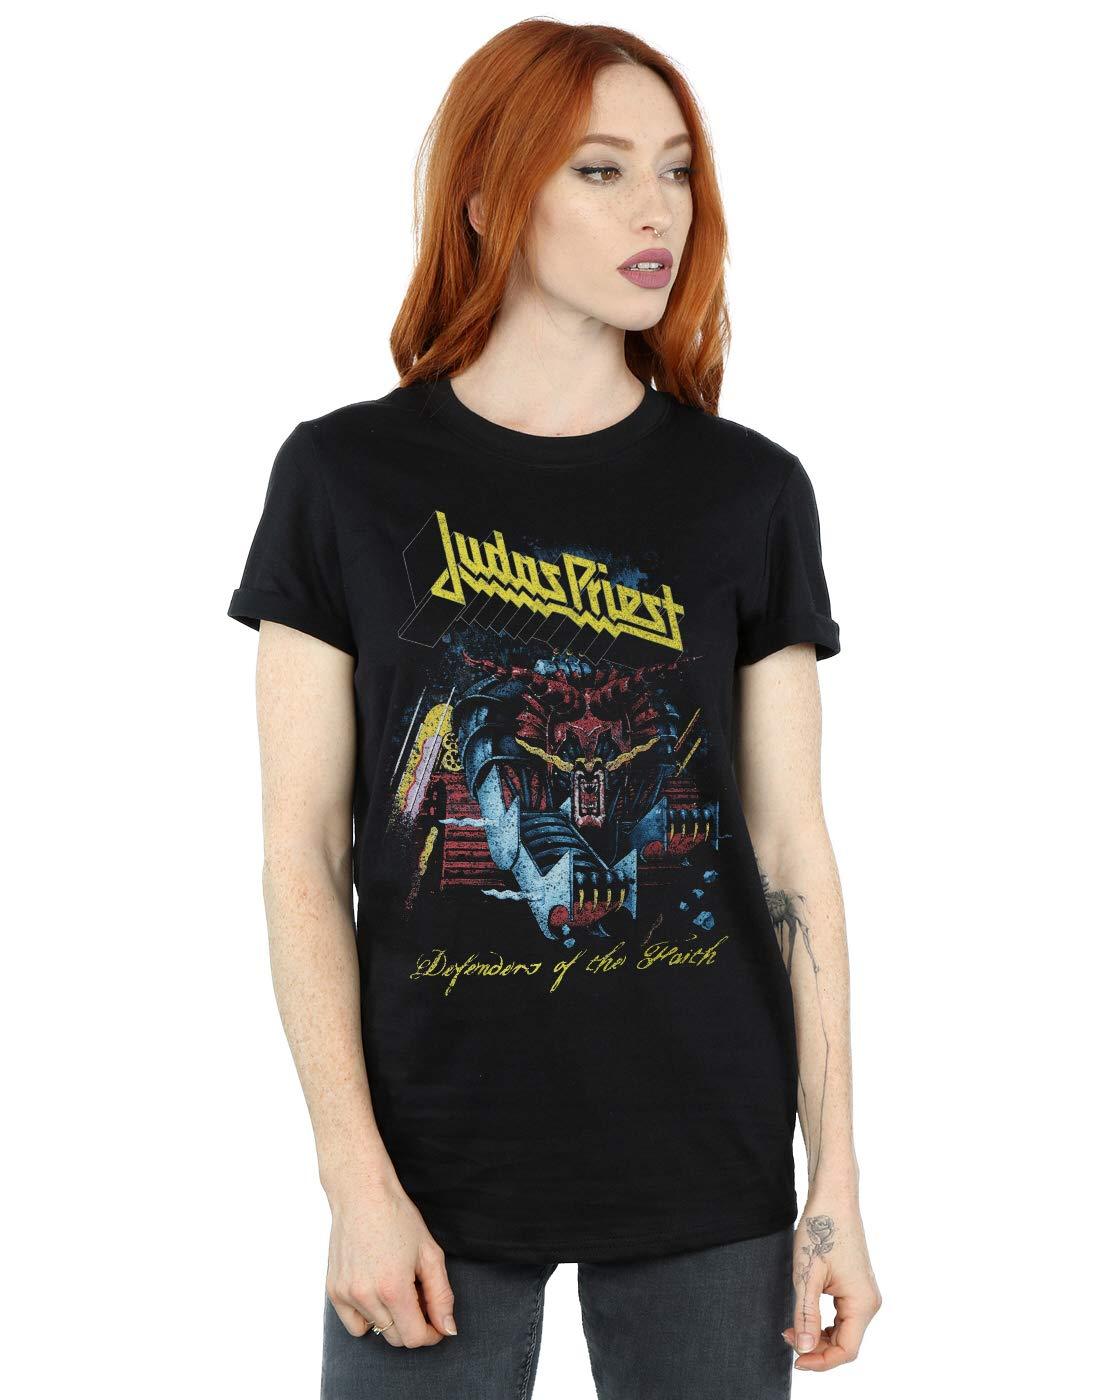 Judas Priest S Defender Of Faith Boyfriend Shirts